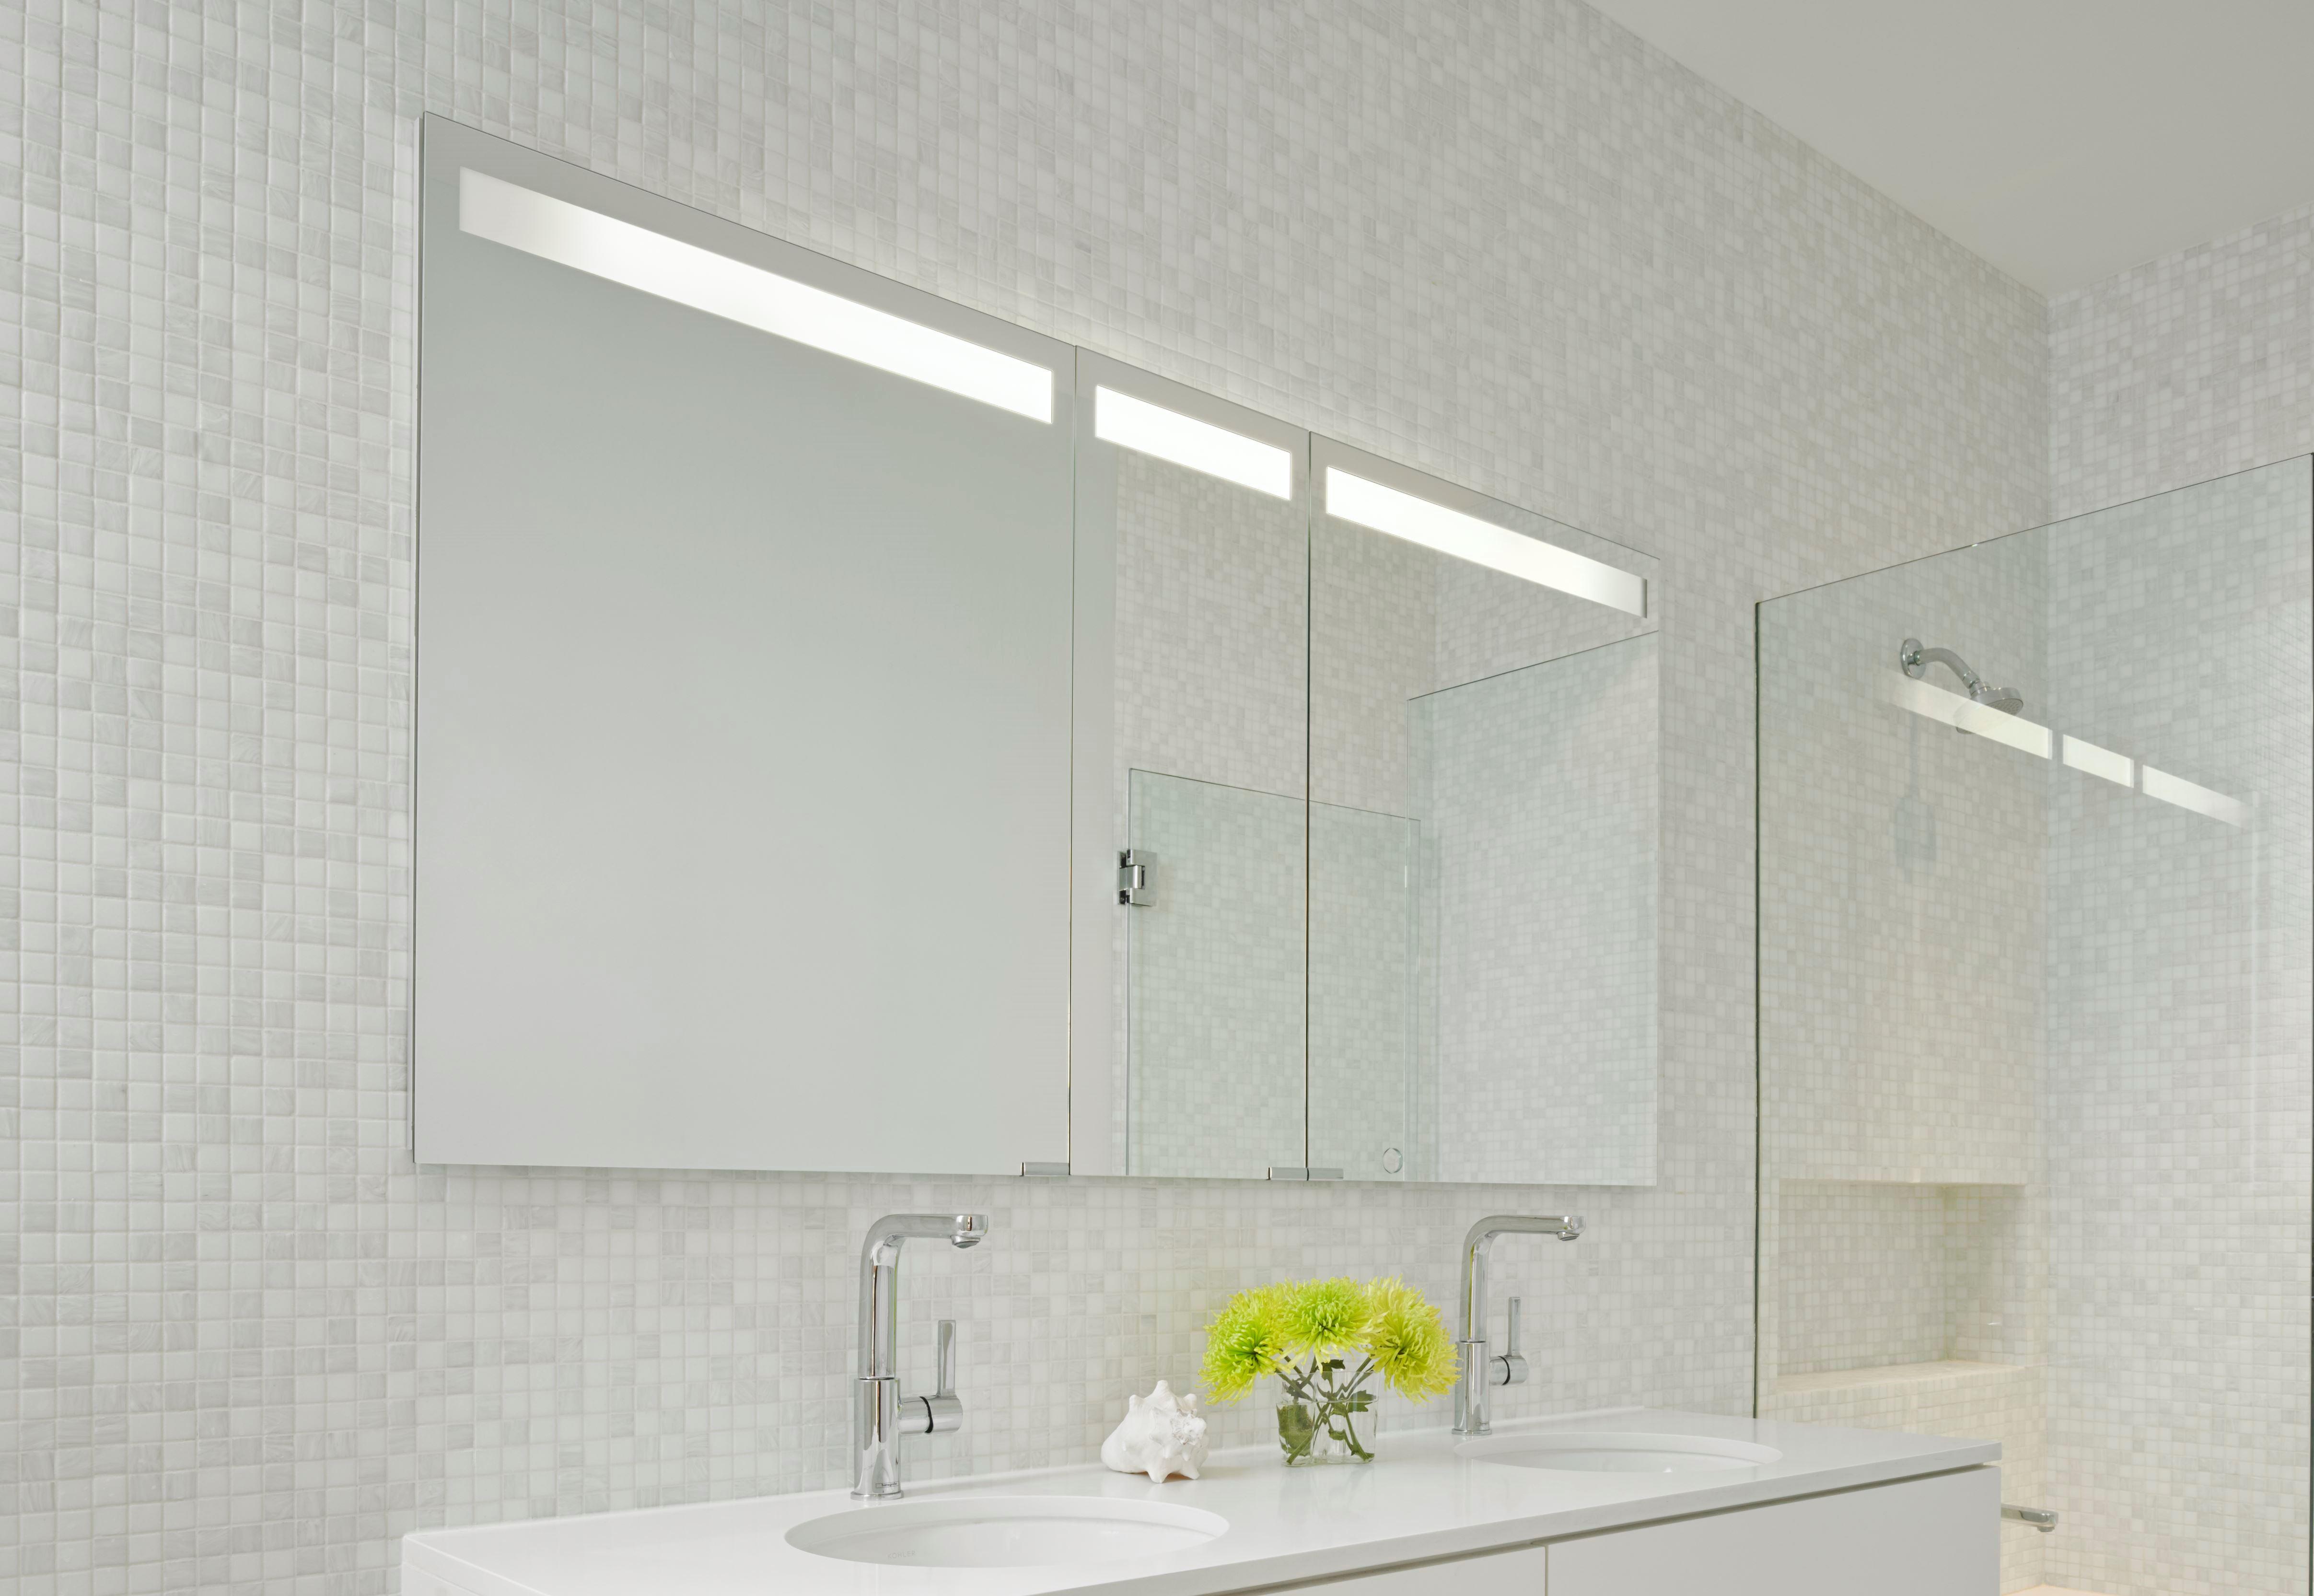 Mirrored bathroom wall cabinets